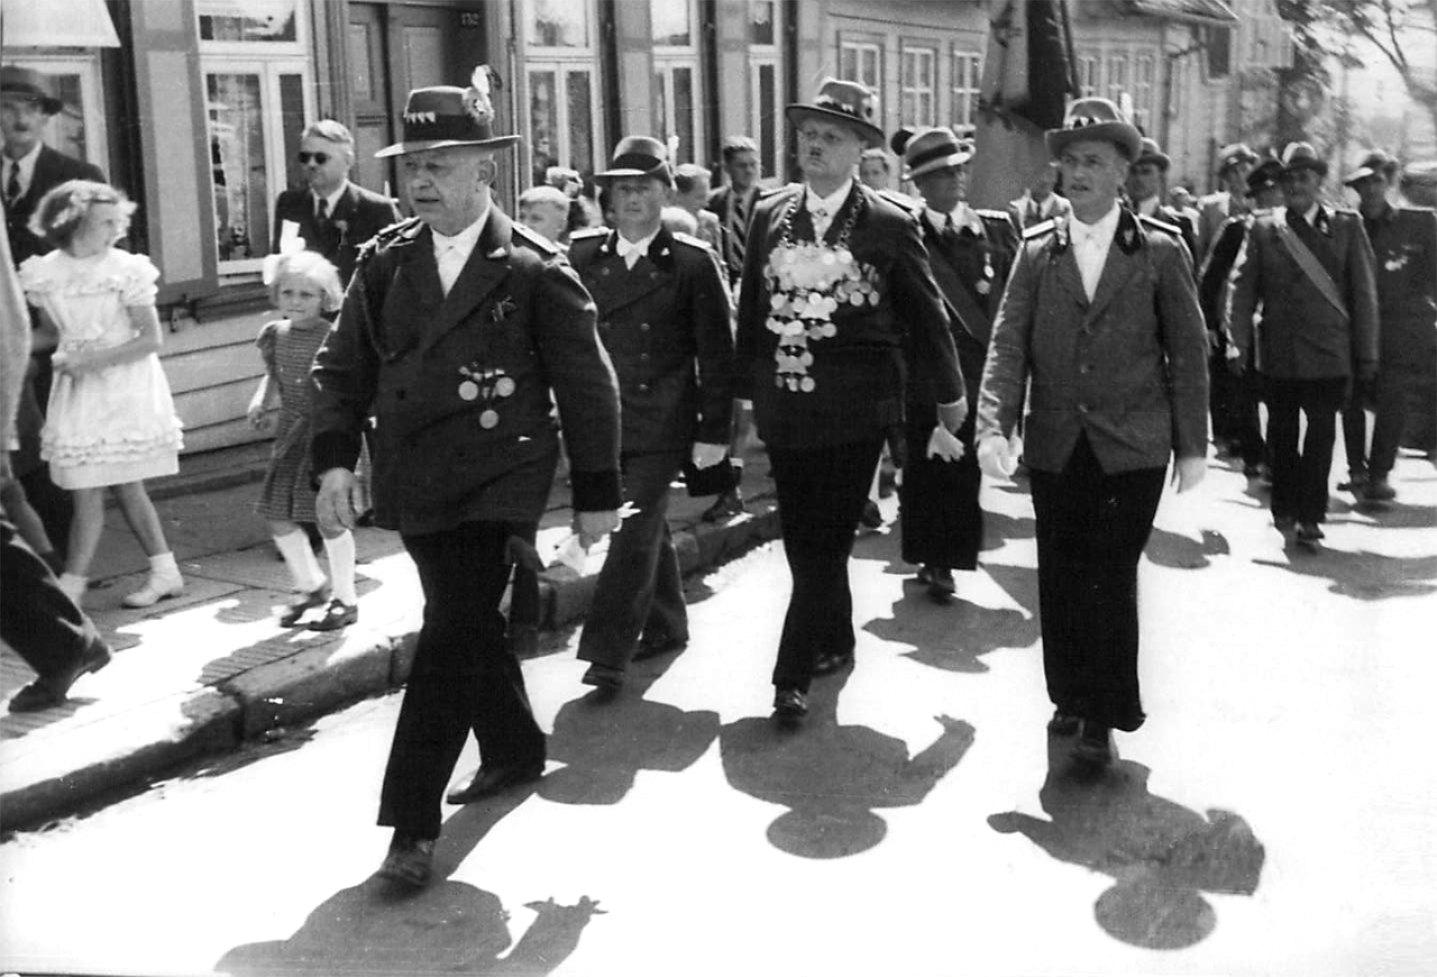 Schützenkönig 1939